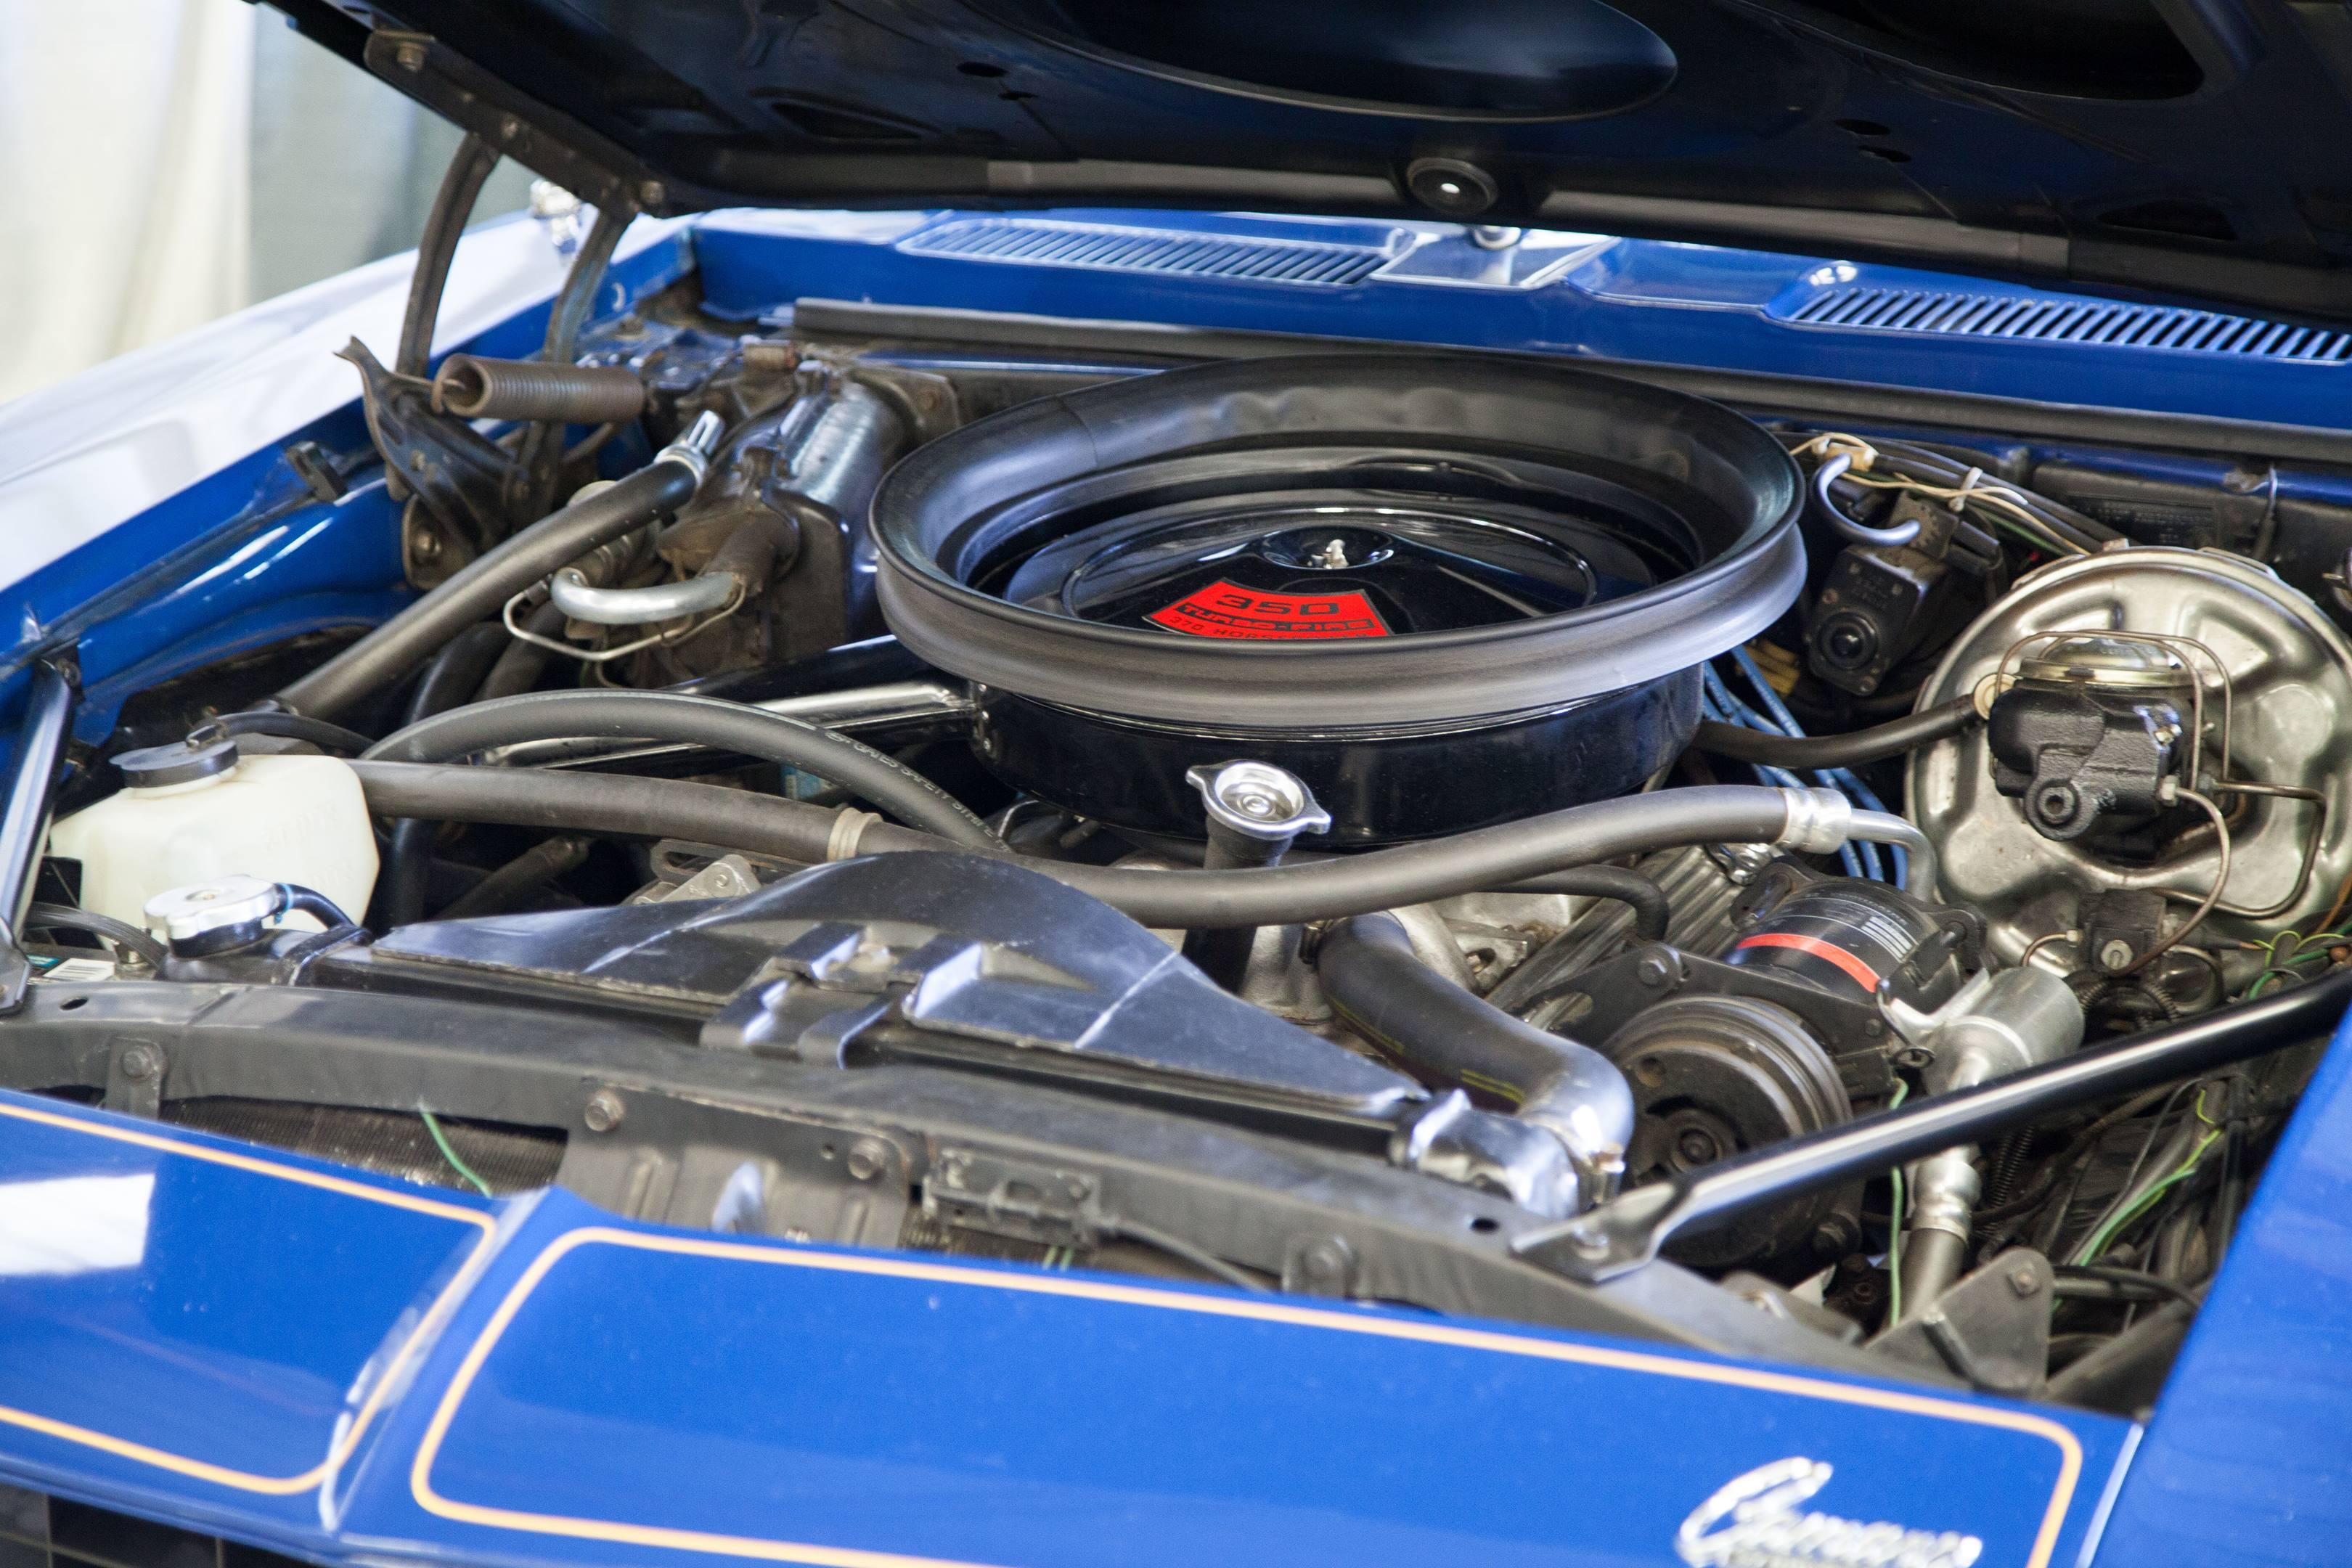 1969 blue maxi camaro car and driver engine lt1